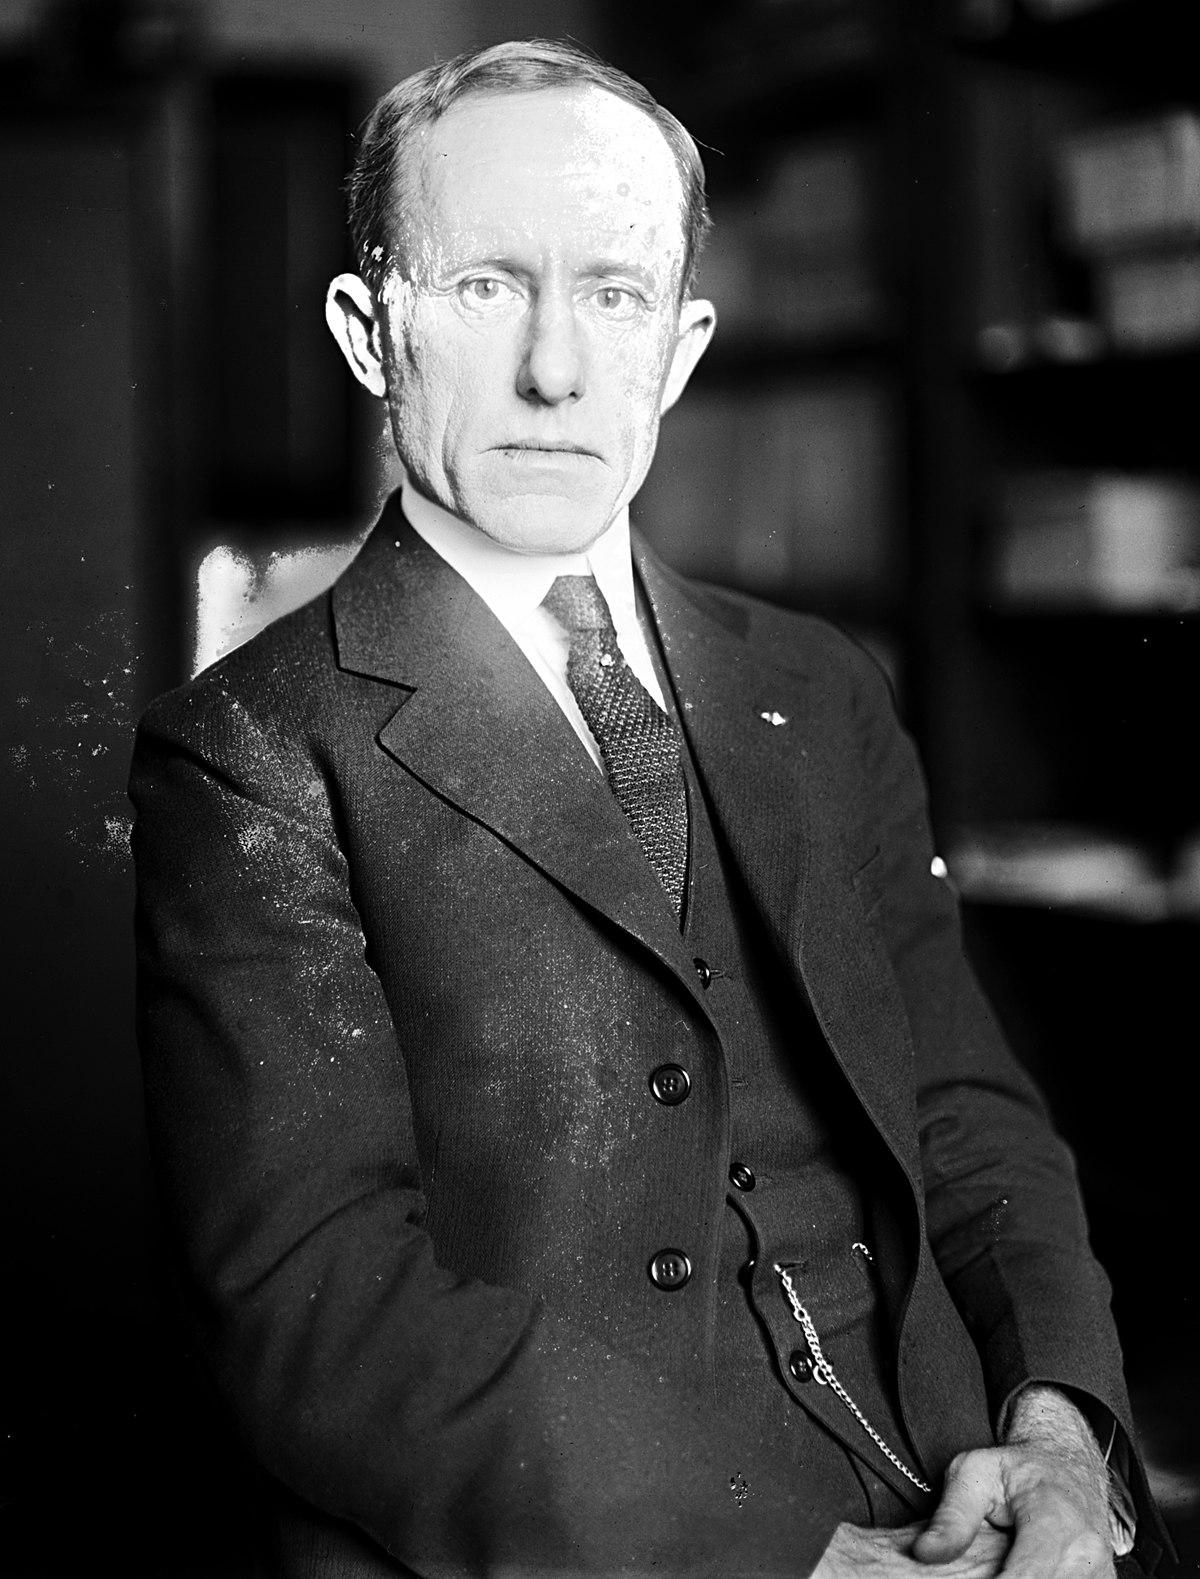 John N. Sandlin - Wikipedia